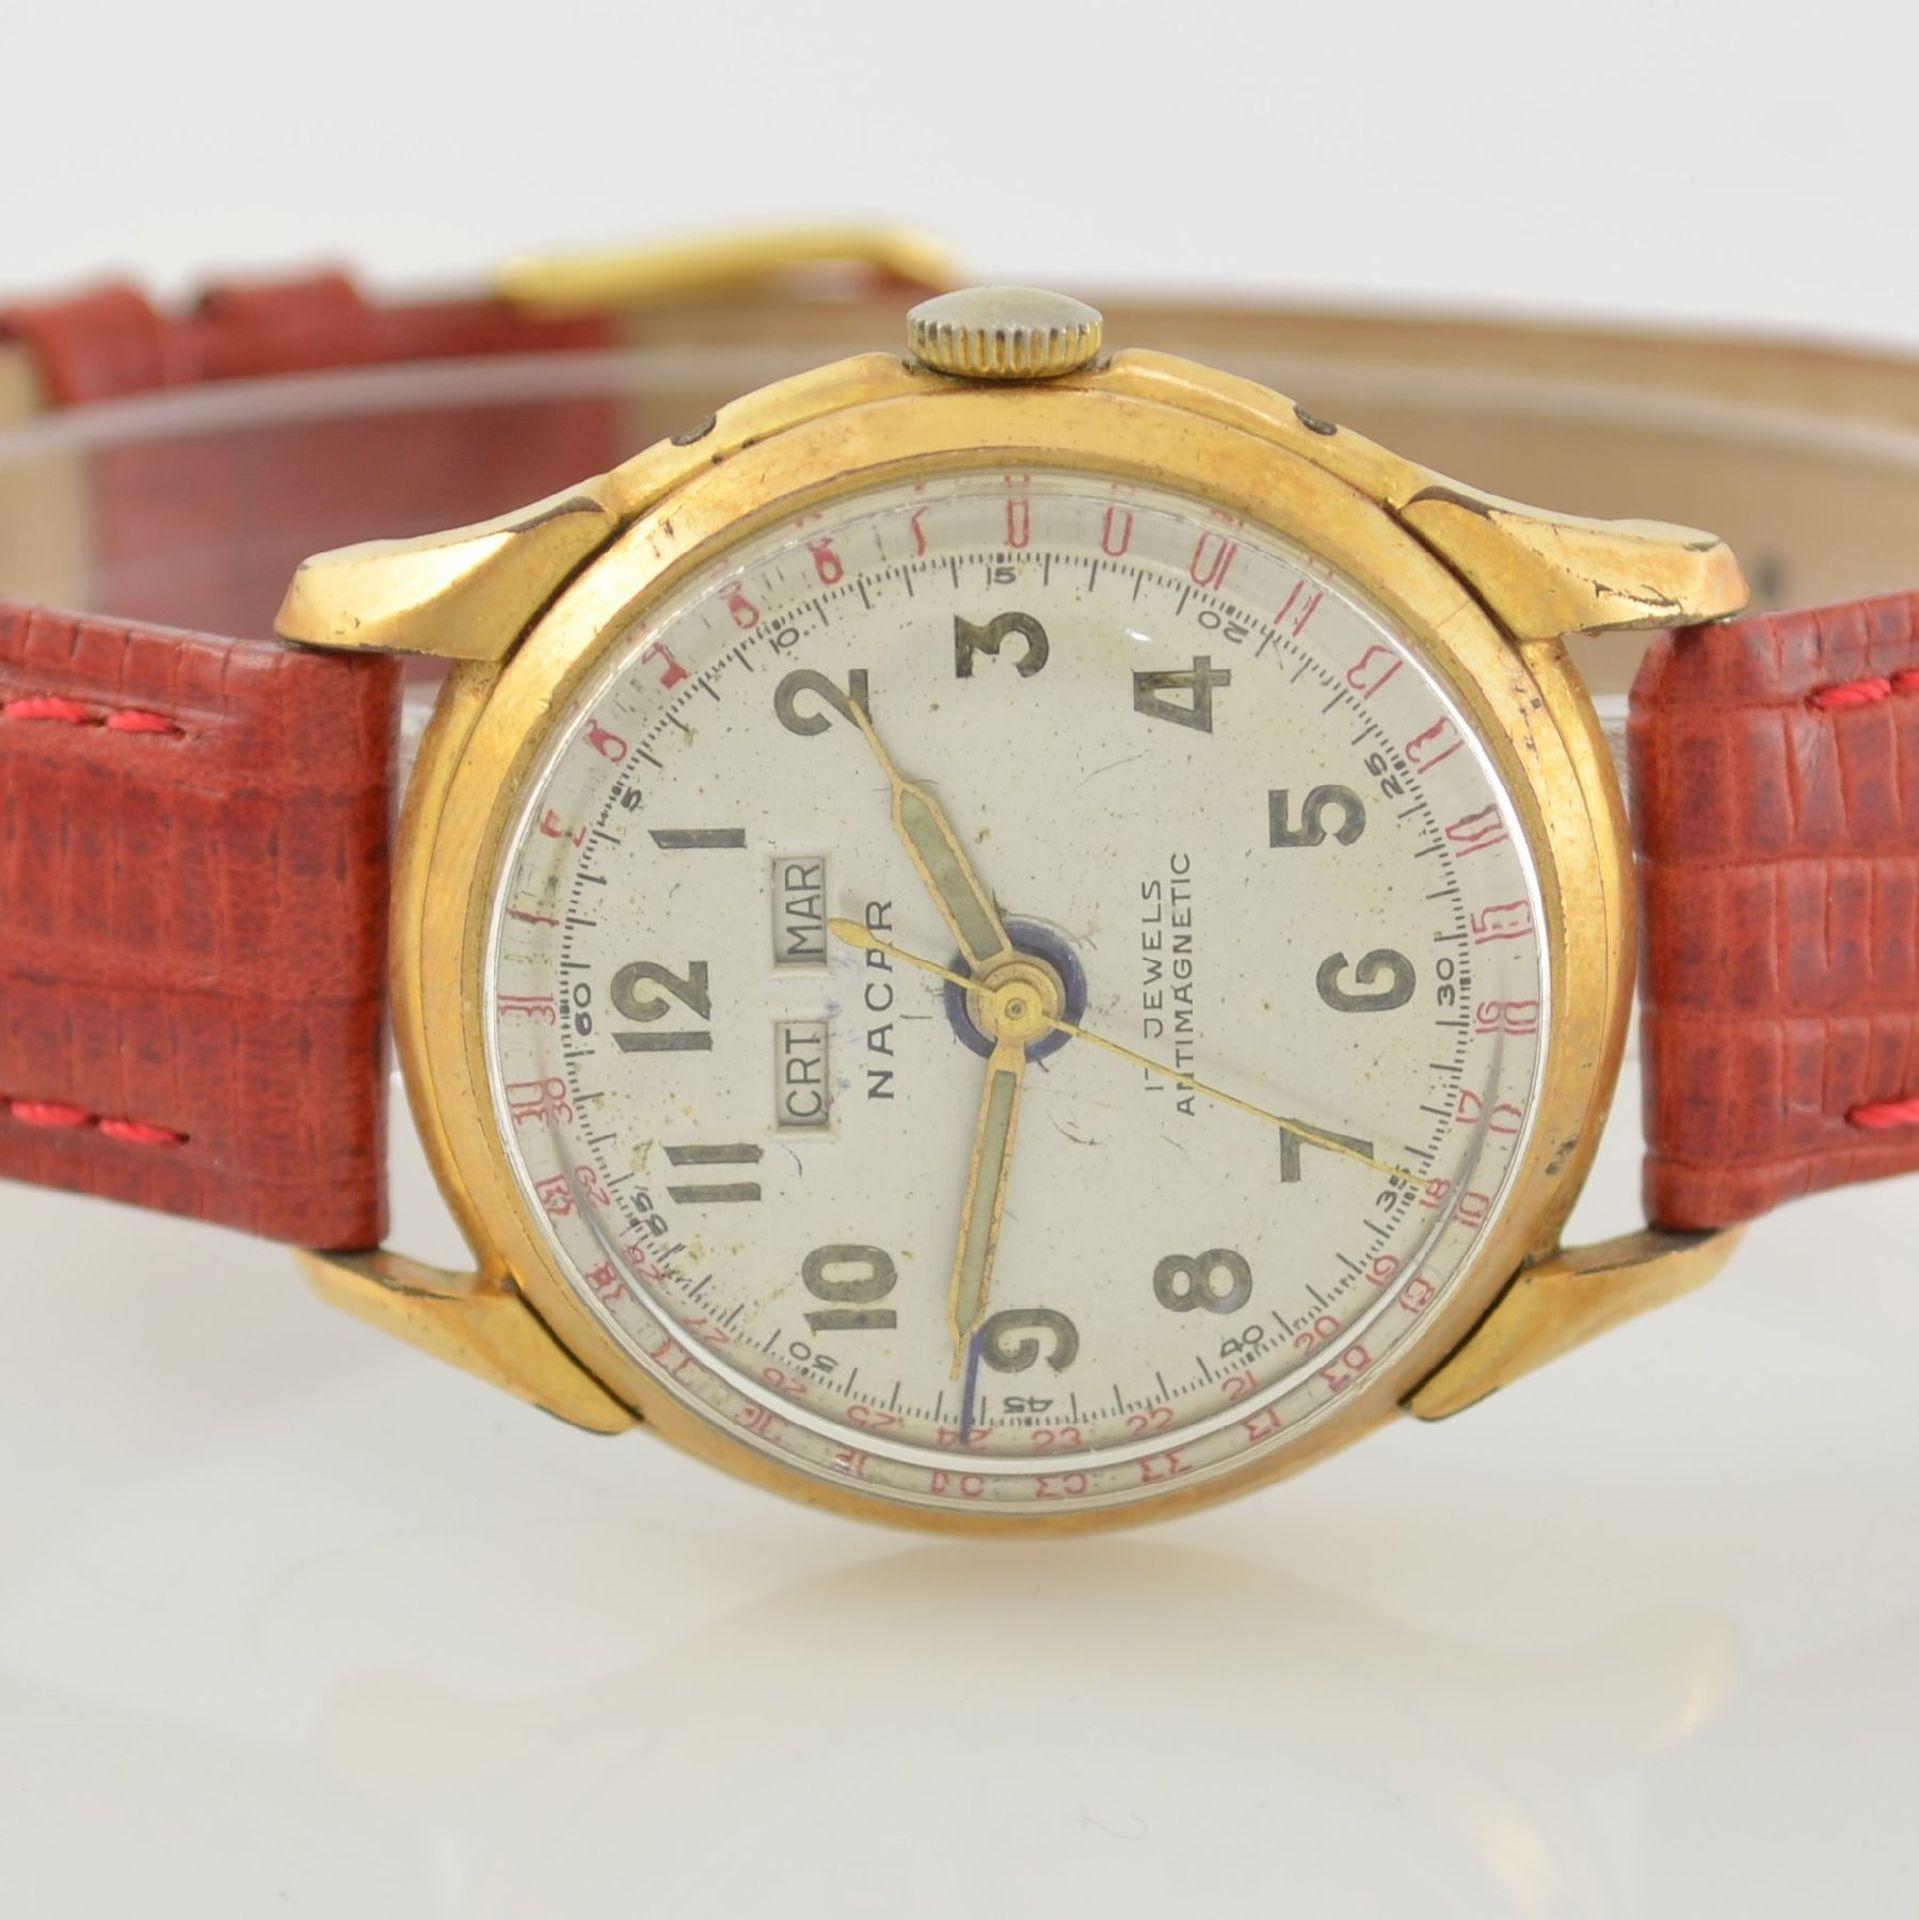 Konvolut: 2 Armbanduhren mit Kalender bzw. Datum, Schweiz um 1950-1960, Handaufzug, 1) NACAR m. - Bild 2 aus 12